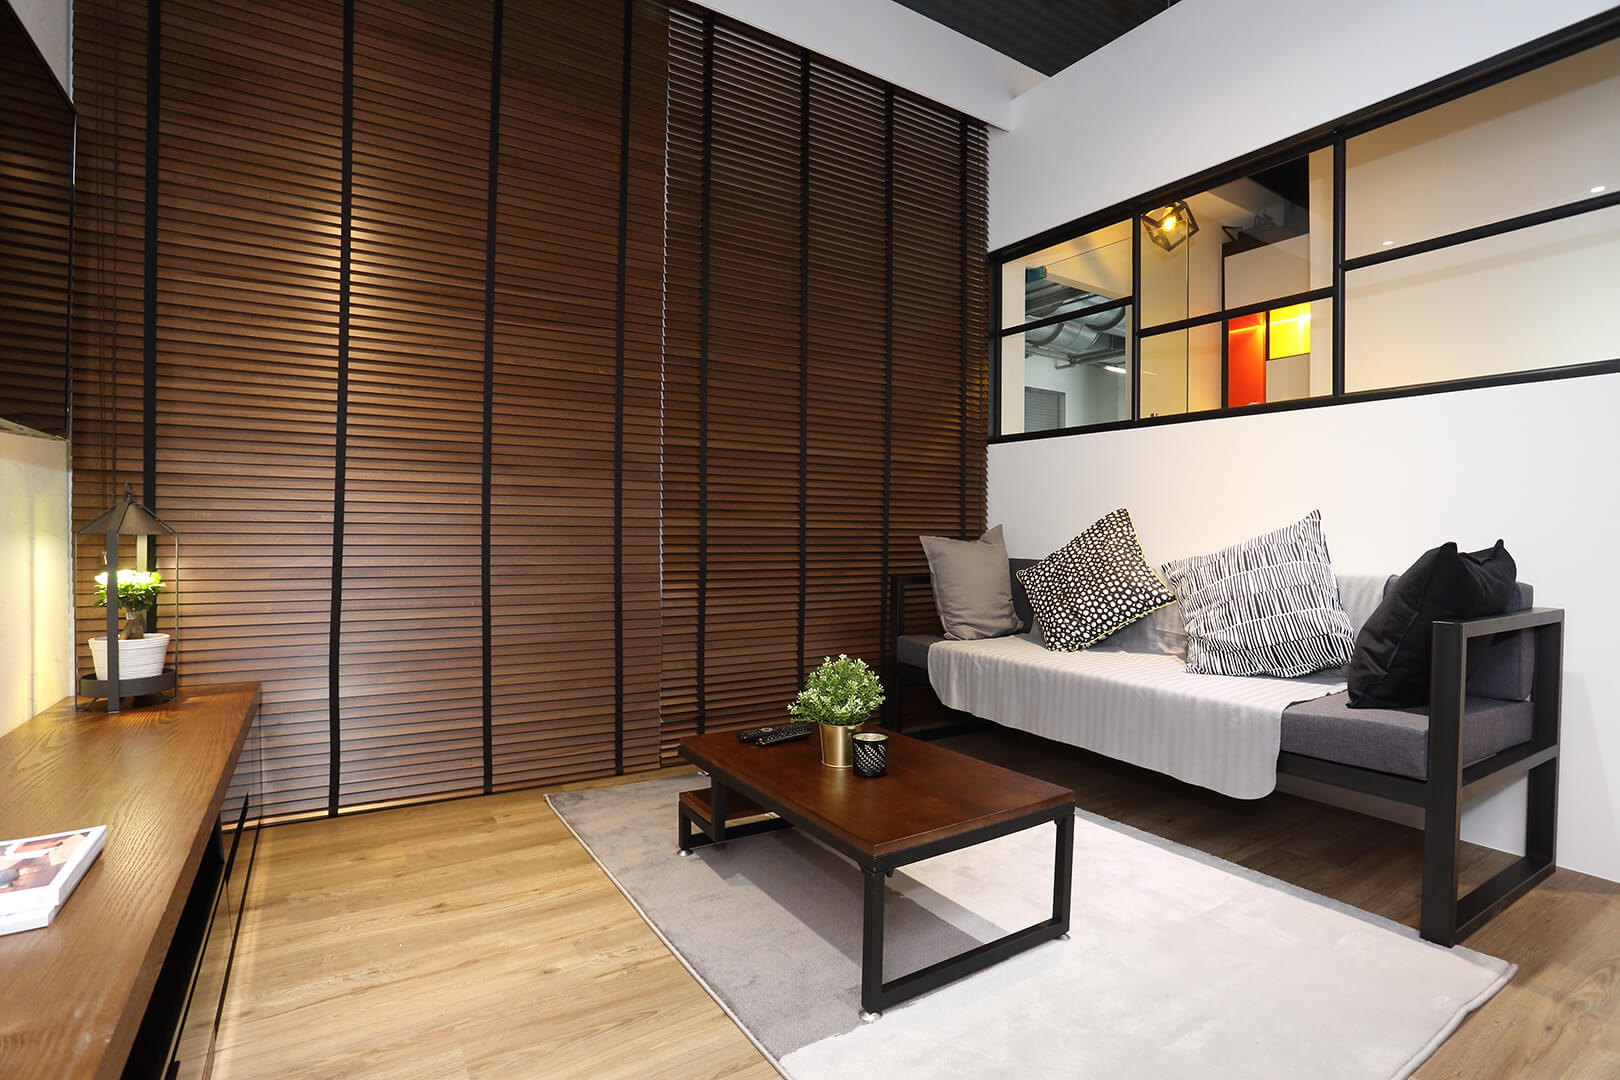 Monoloft's Design Studio Renovation Side Corner View